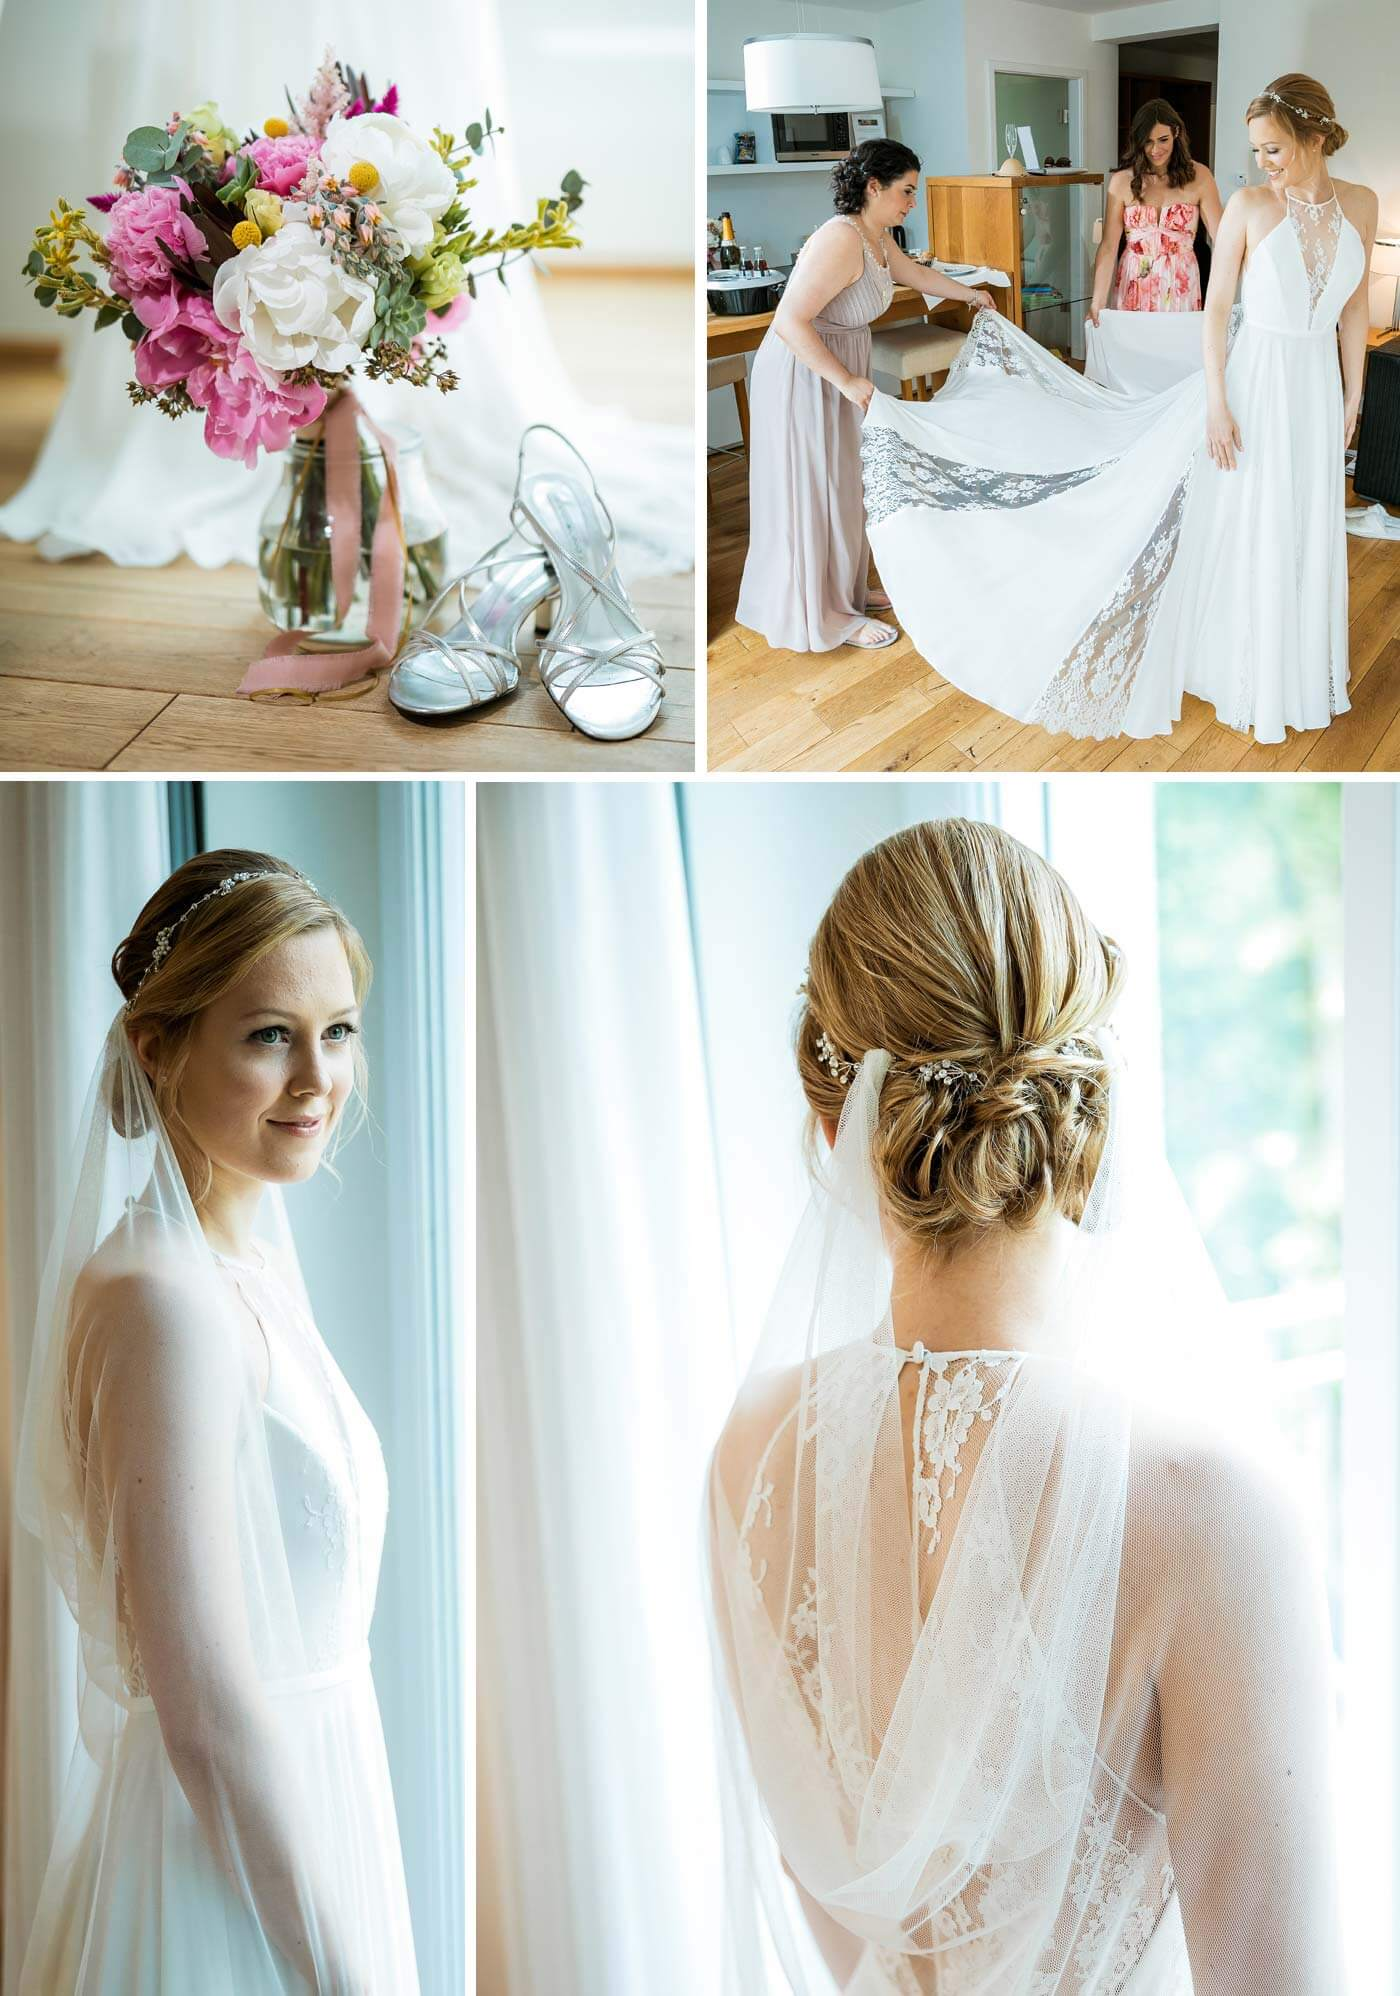 Hochzeitsoutfit Braut